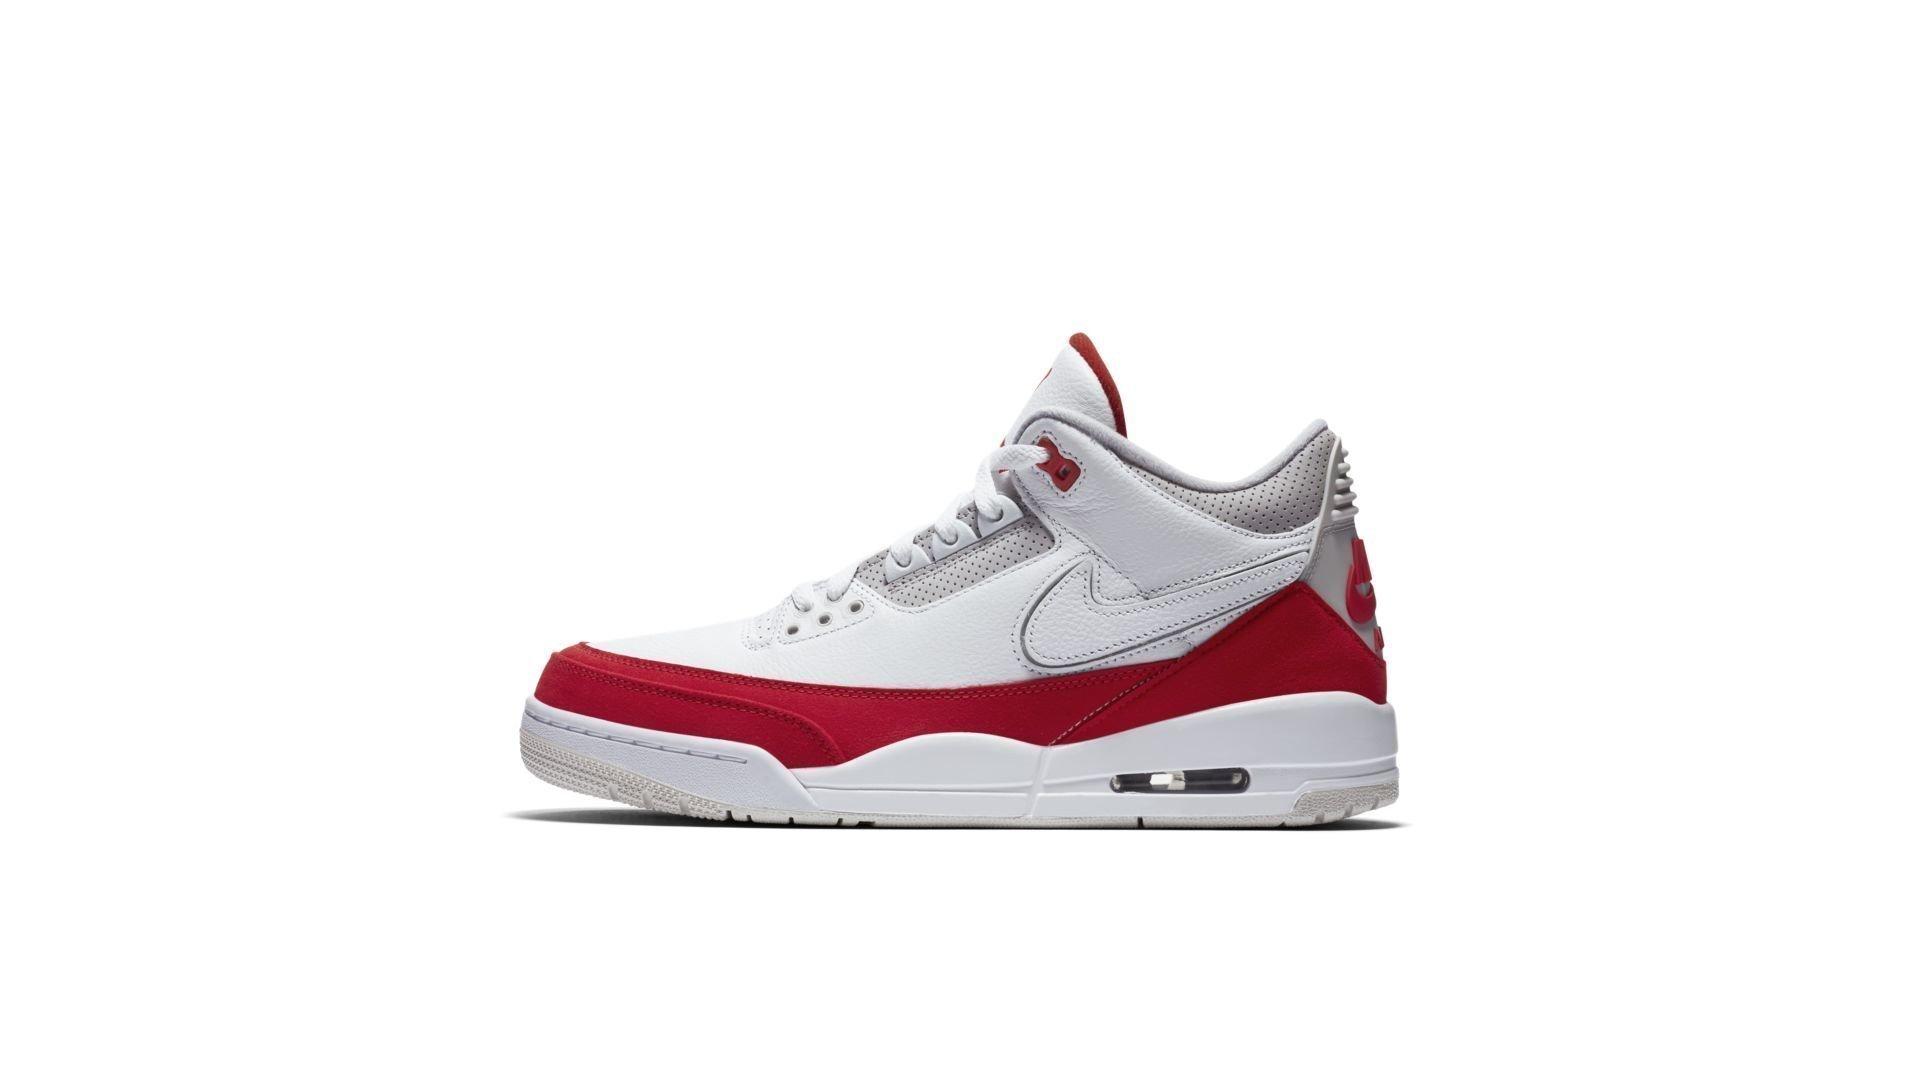 Jordan 3 Retro Tinker White University Red (CJ0939-100)